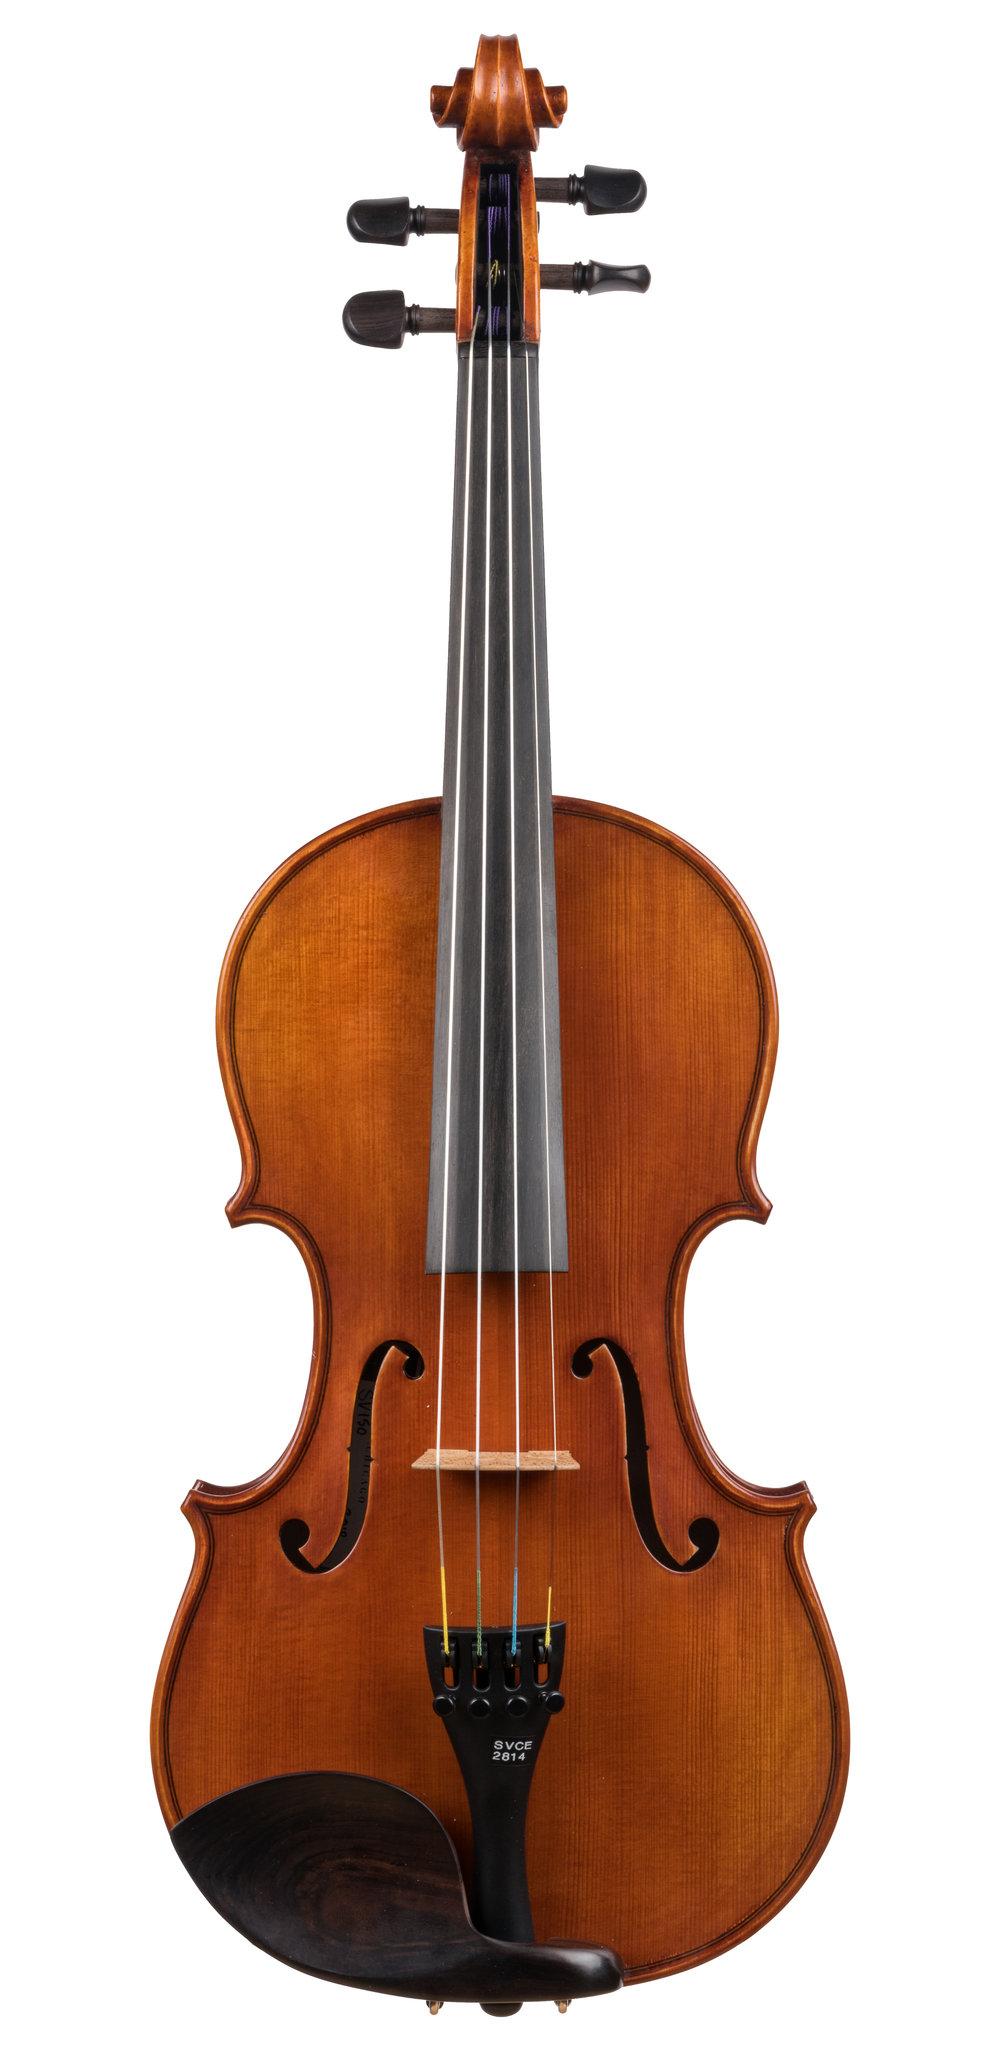 Seman Violins SV150 -